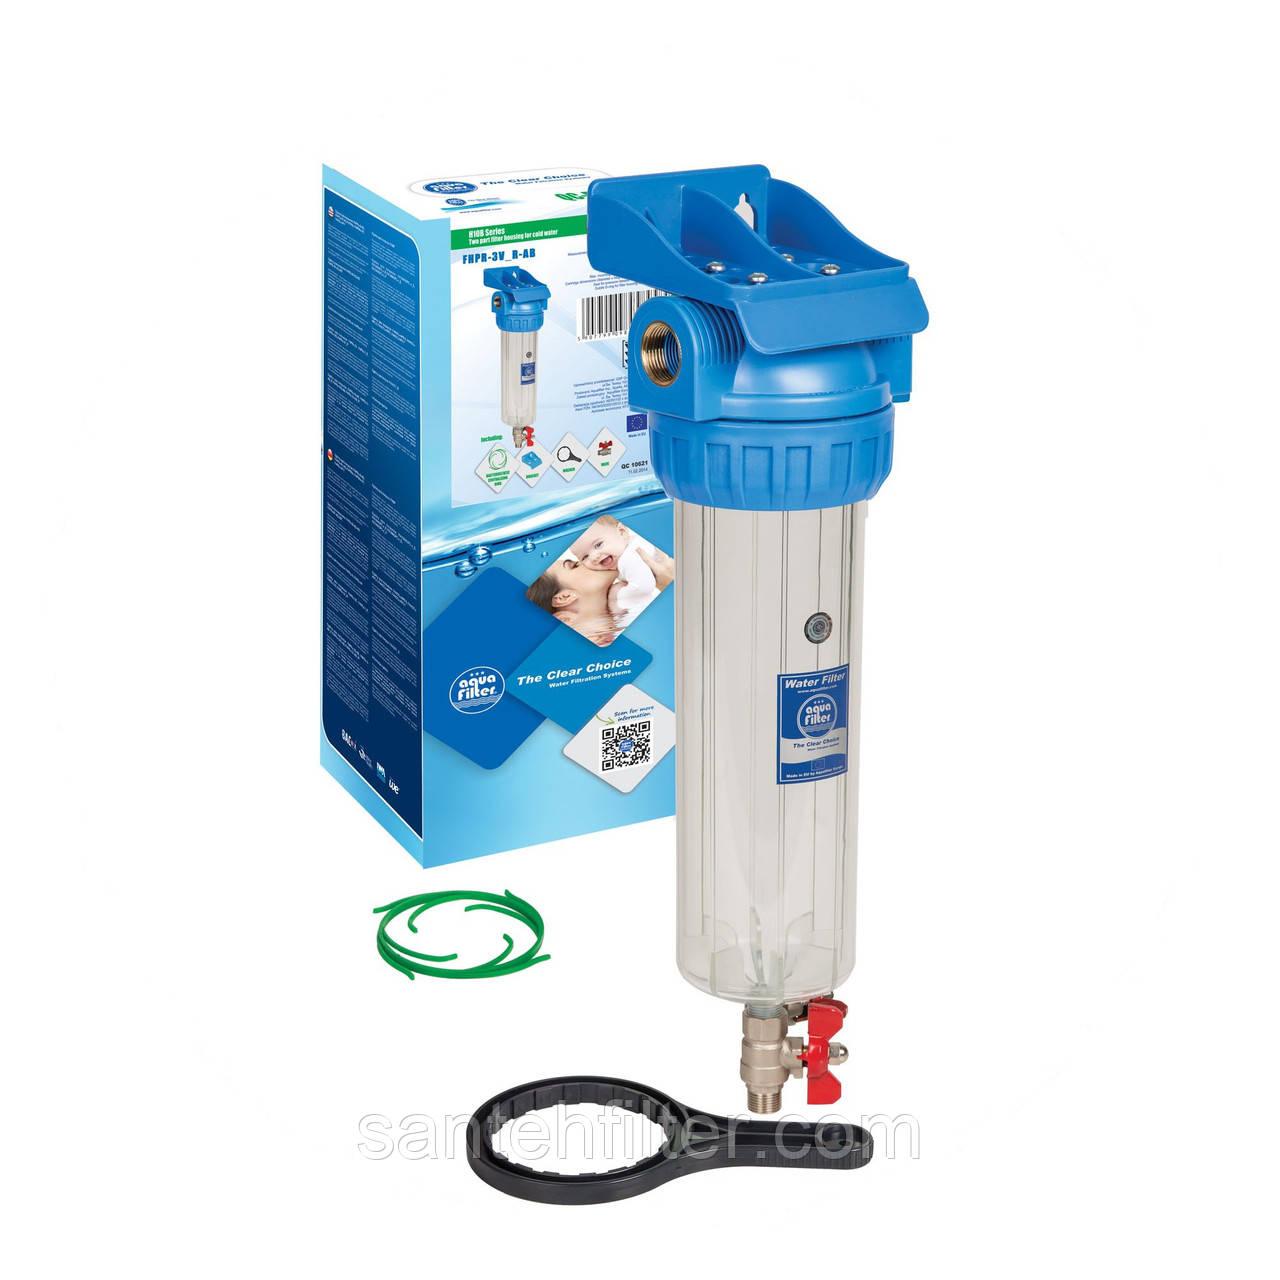 "Колба самопромывная 1/2"" Aquafilter (Аквафільтр для холодної води)"